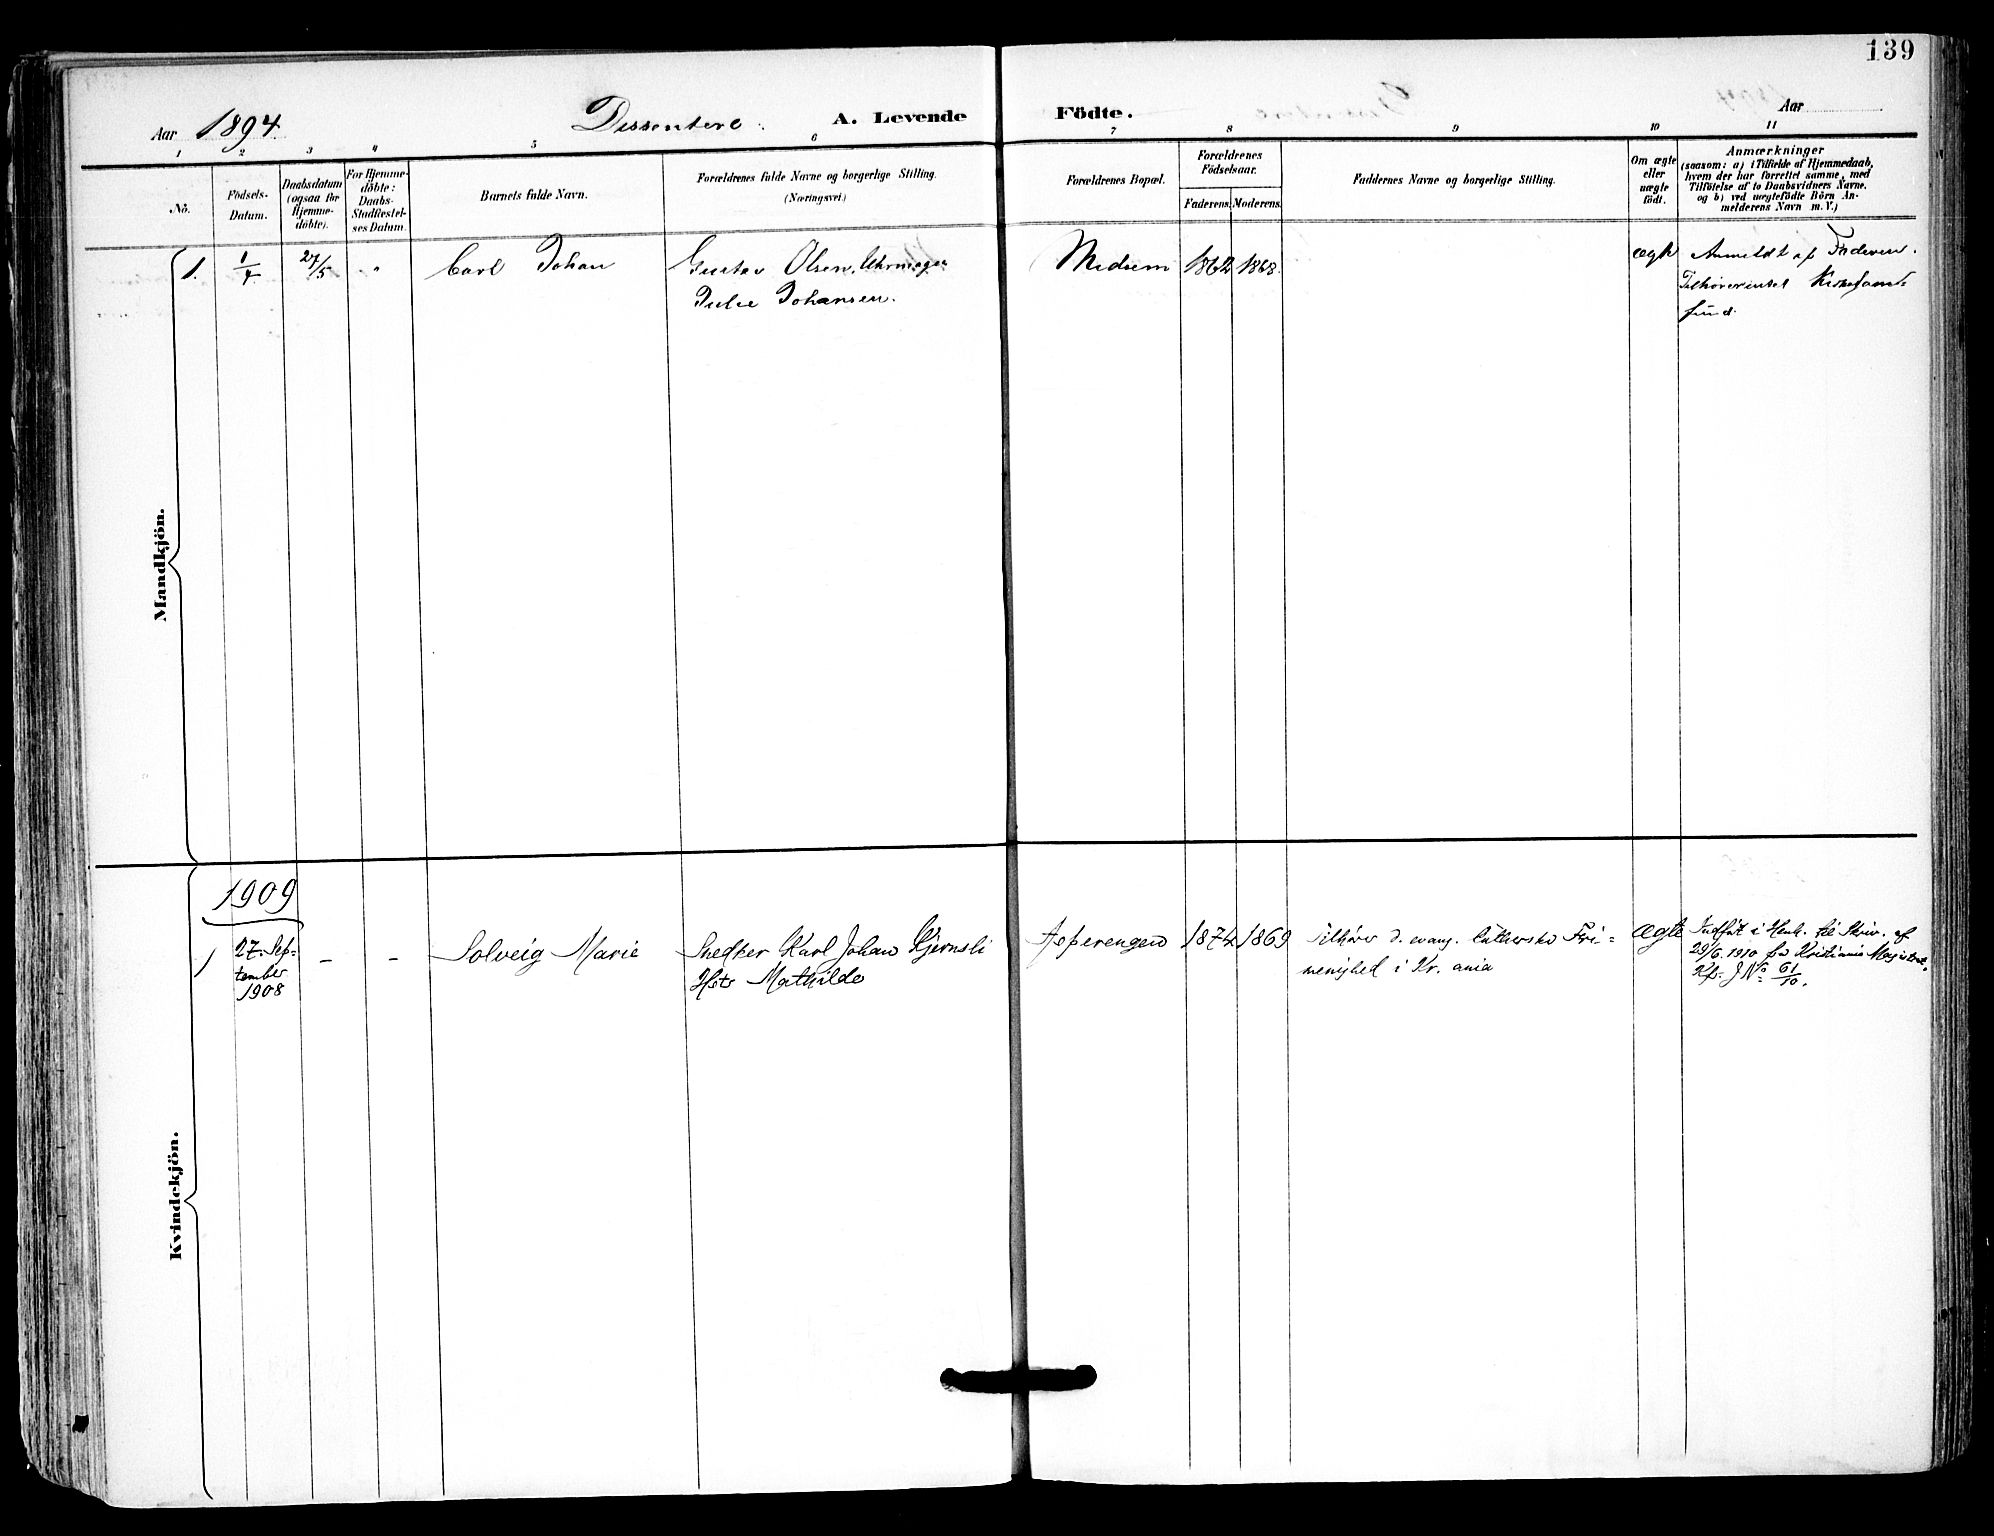 SAO, Kråkstad prestekontor Kirkebøker, F/Fa/L0010: Ministerialbok nr. I 10, 1893-1931, s. 139